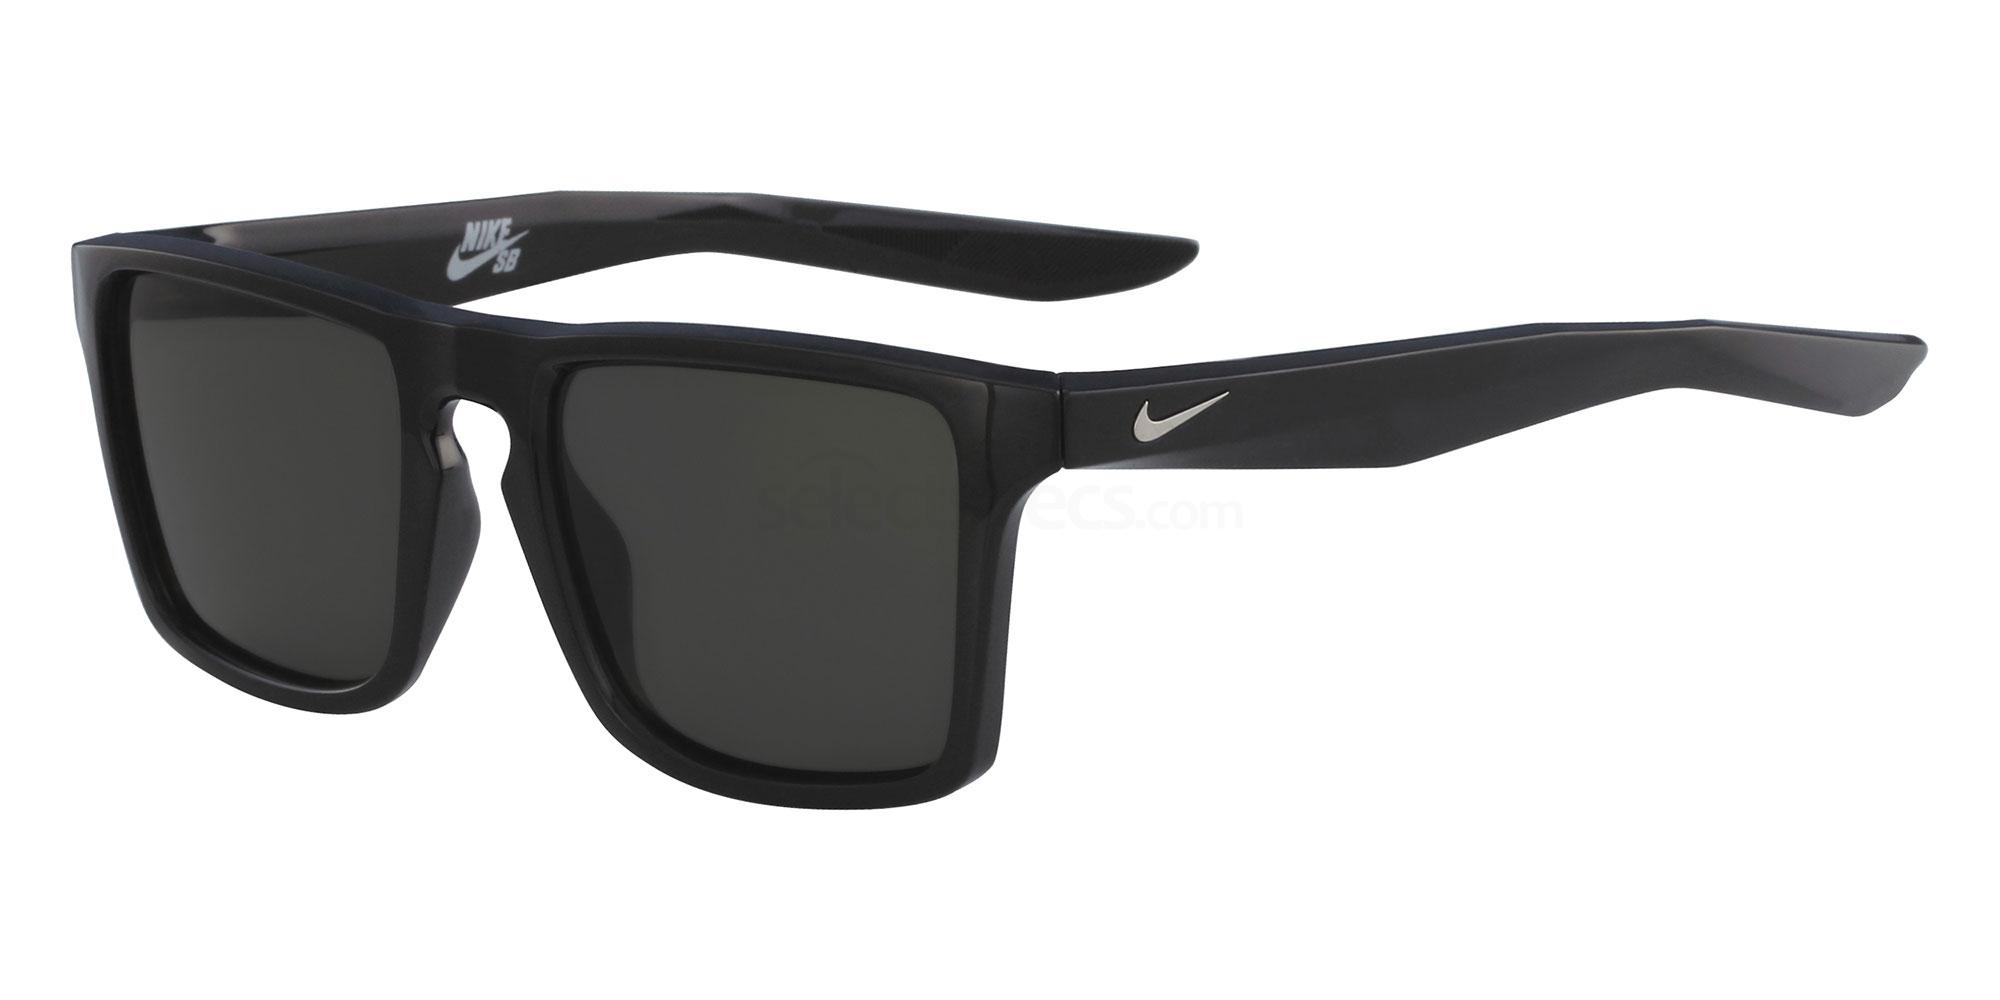 001 VERGE P EV1099 Sunglasses, Nike